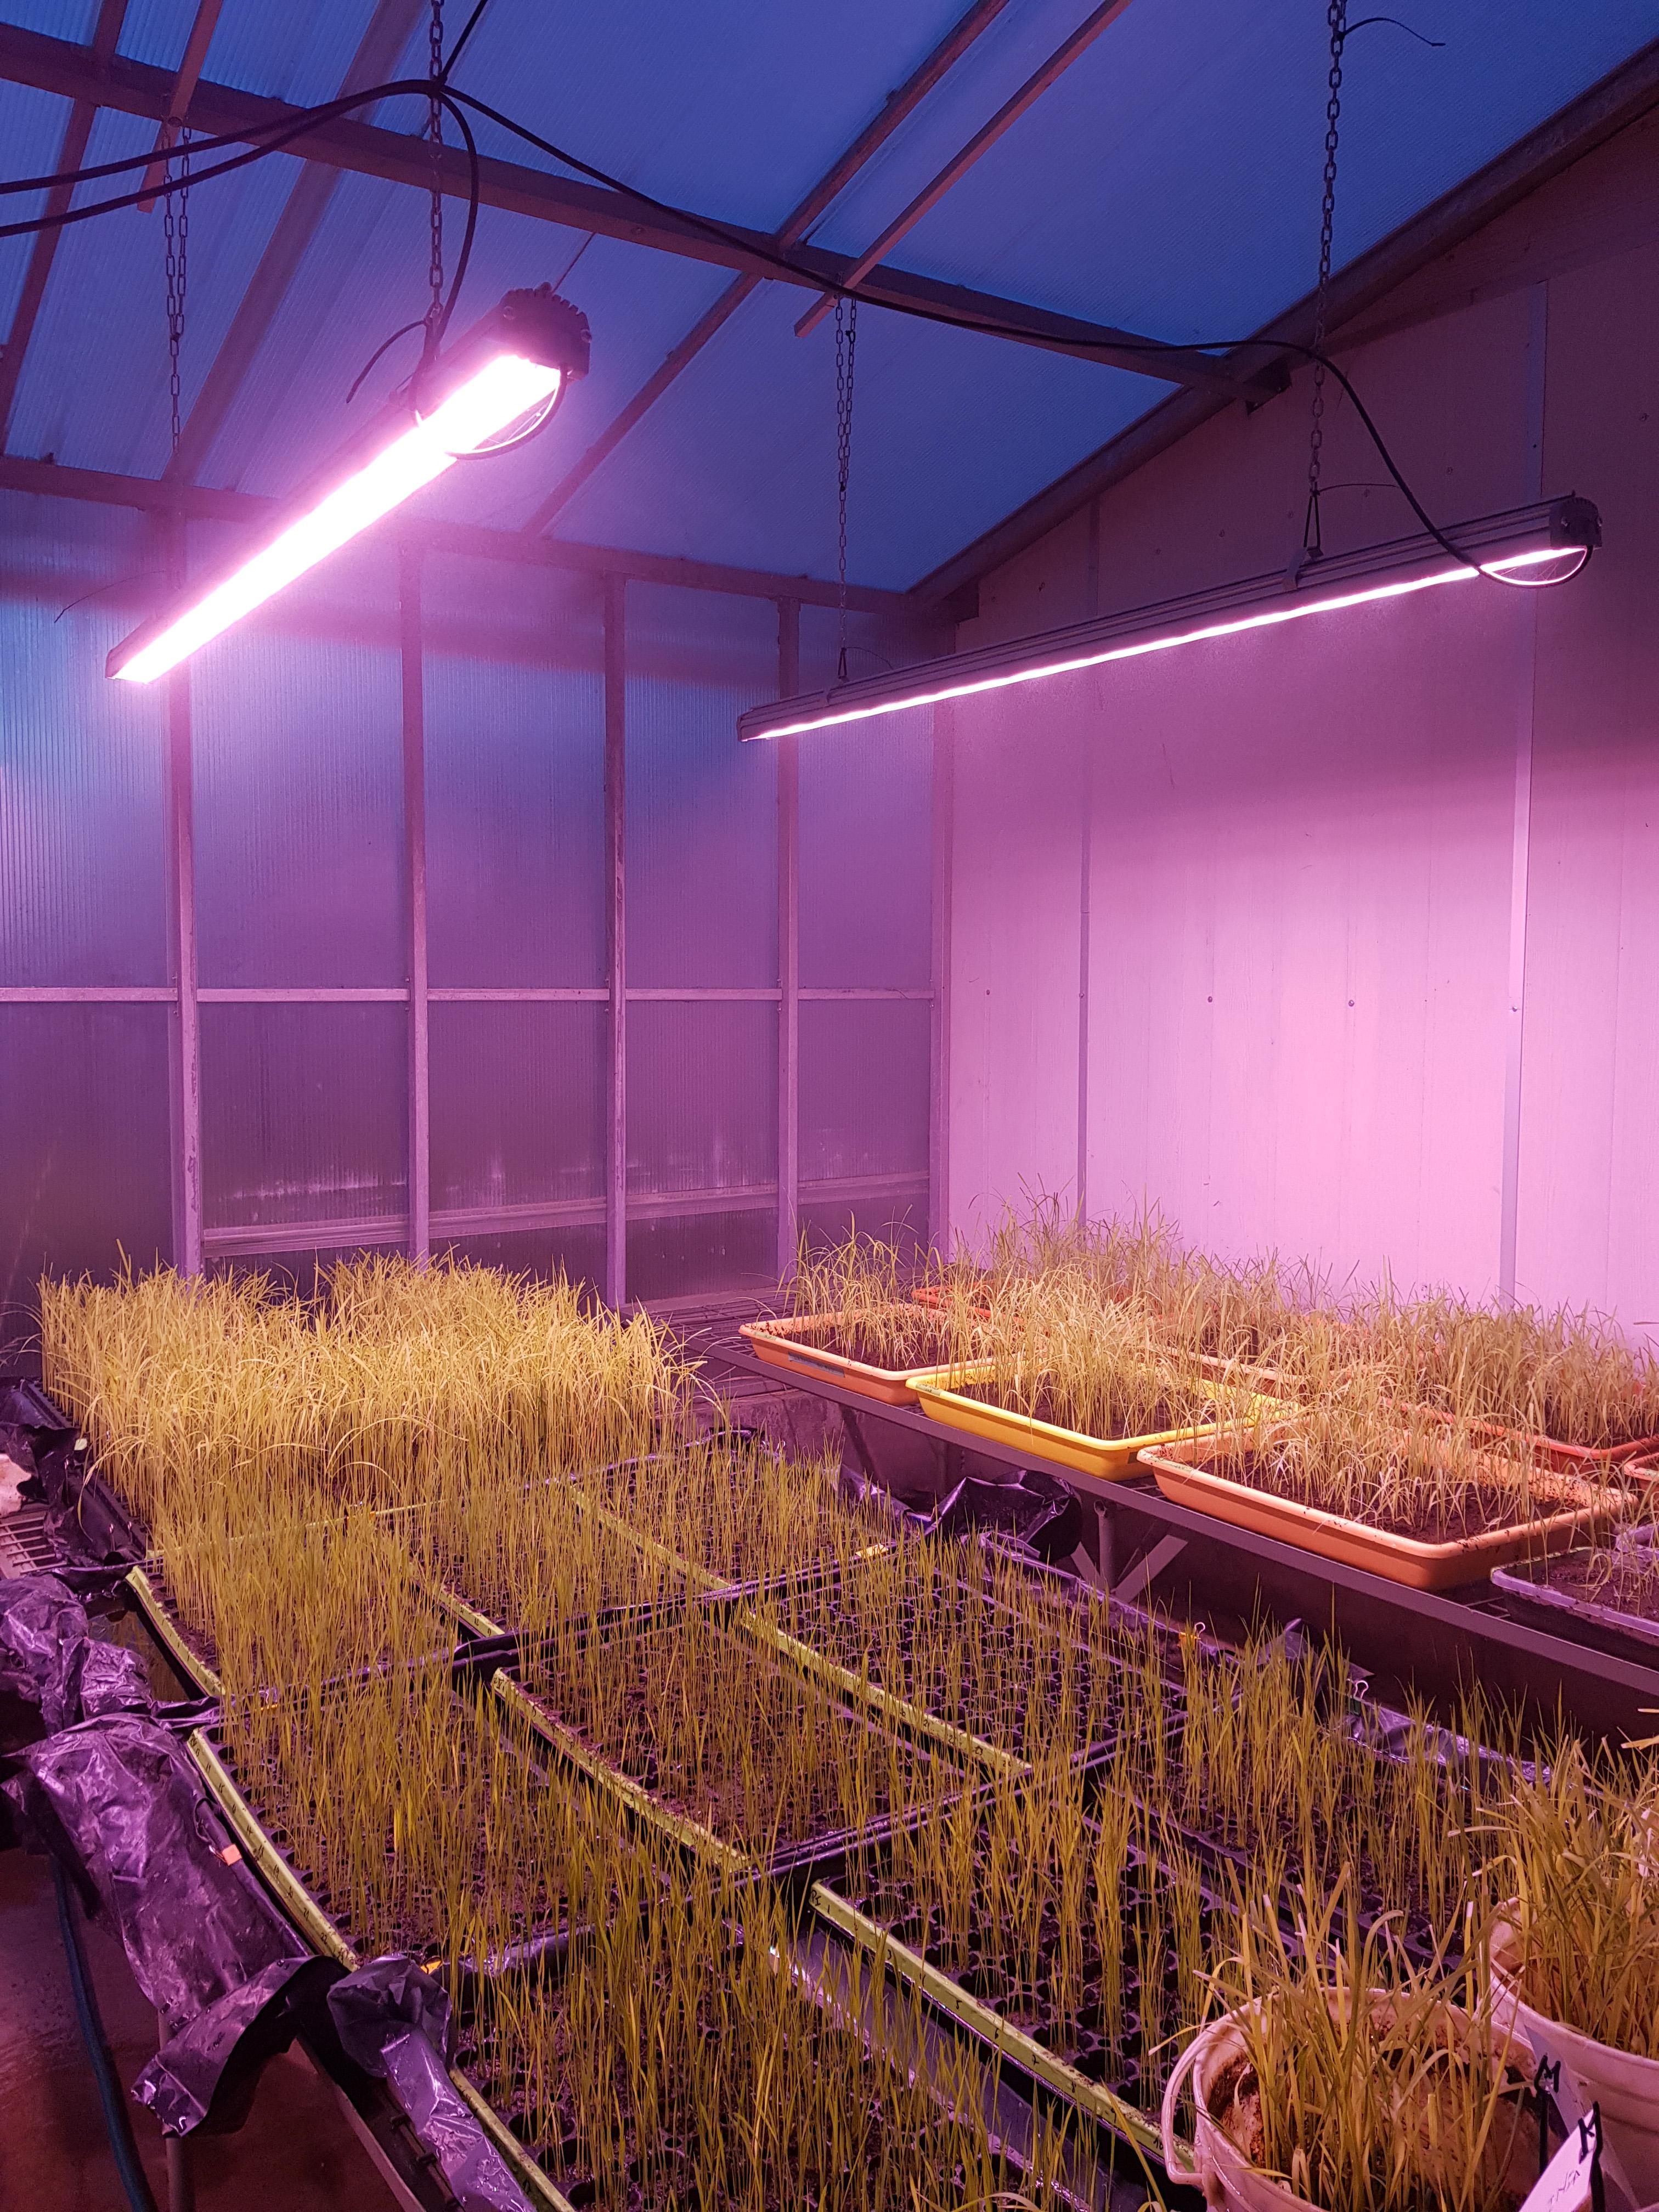 https://www.advanticsys.com/wp-content/uploads/2018/11/greenhouse-inia-lighting2.jpg